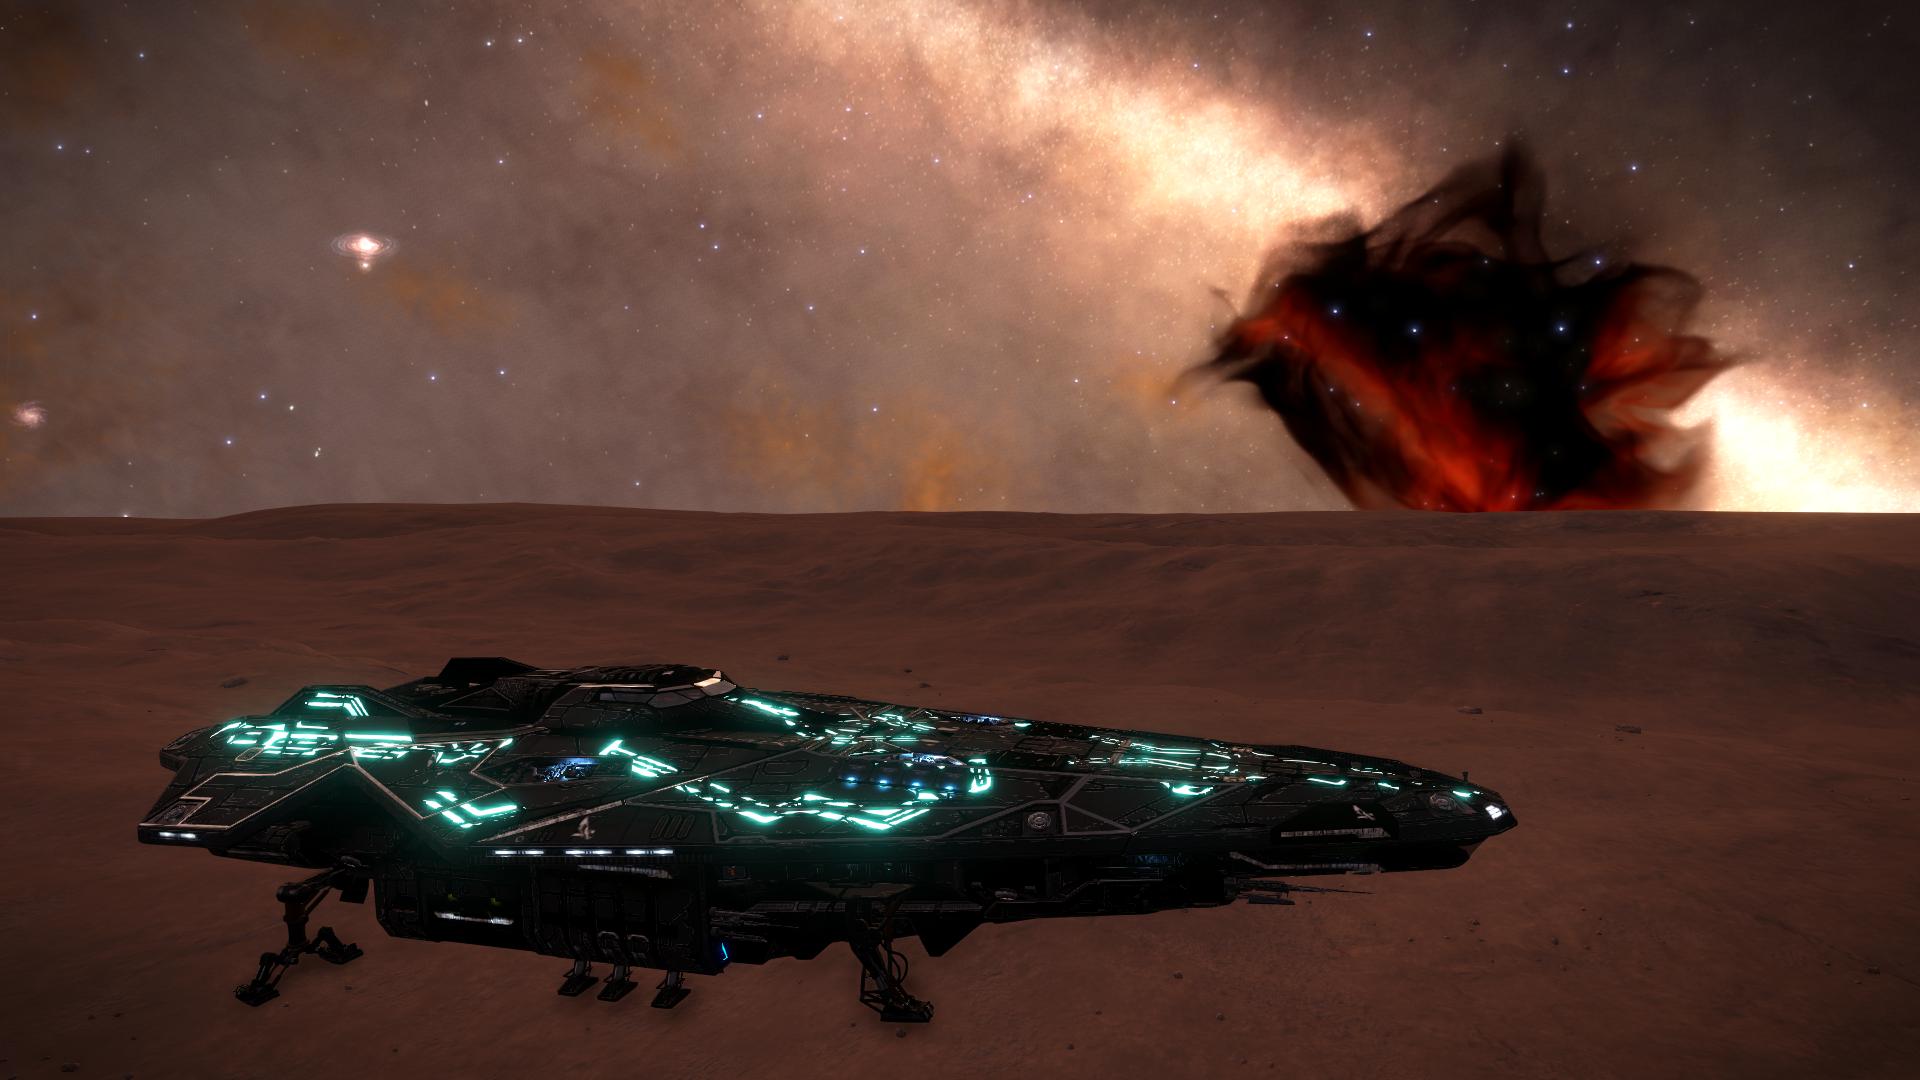 Wallpaper Elite Dangerous Video Games Space Nebula Anaconda